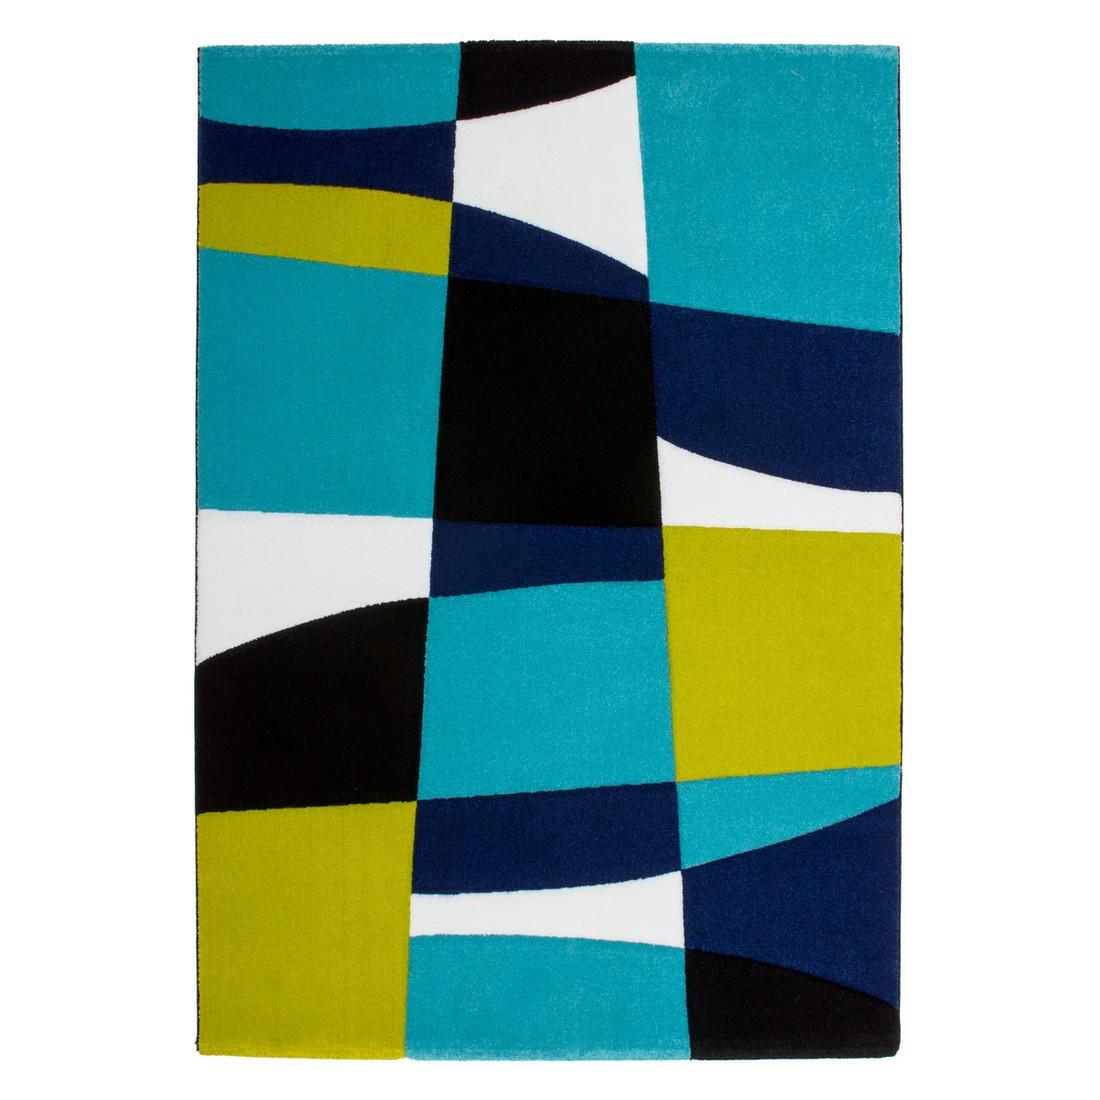 Teppich Lifestyle – Schwarz/Aqua – 160 x 230 cm, Obsession online kaufen